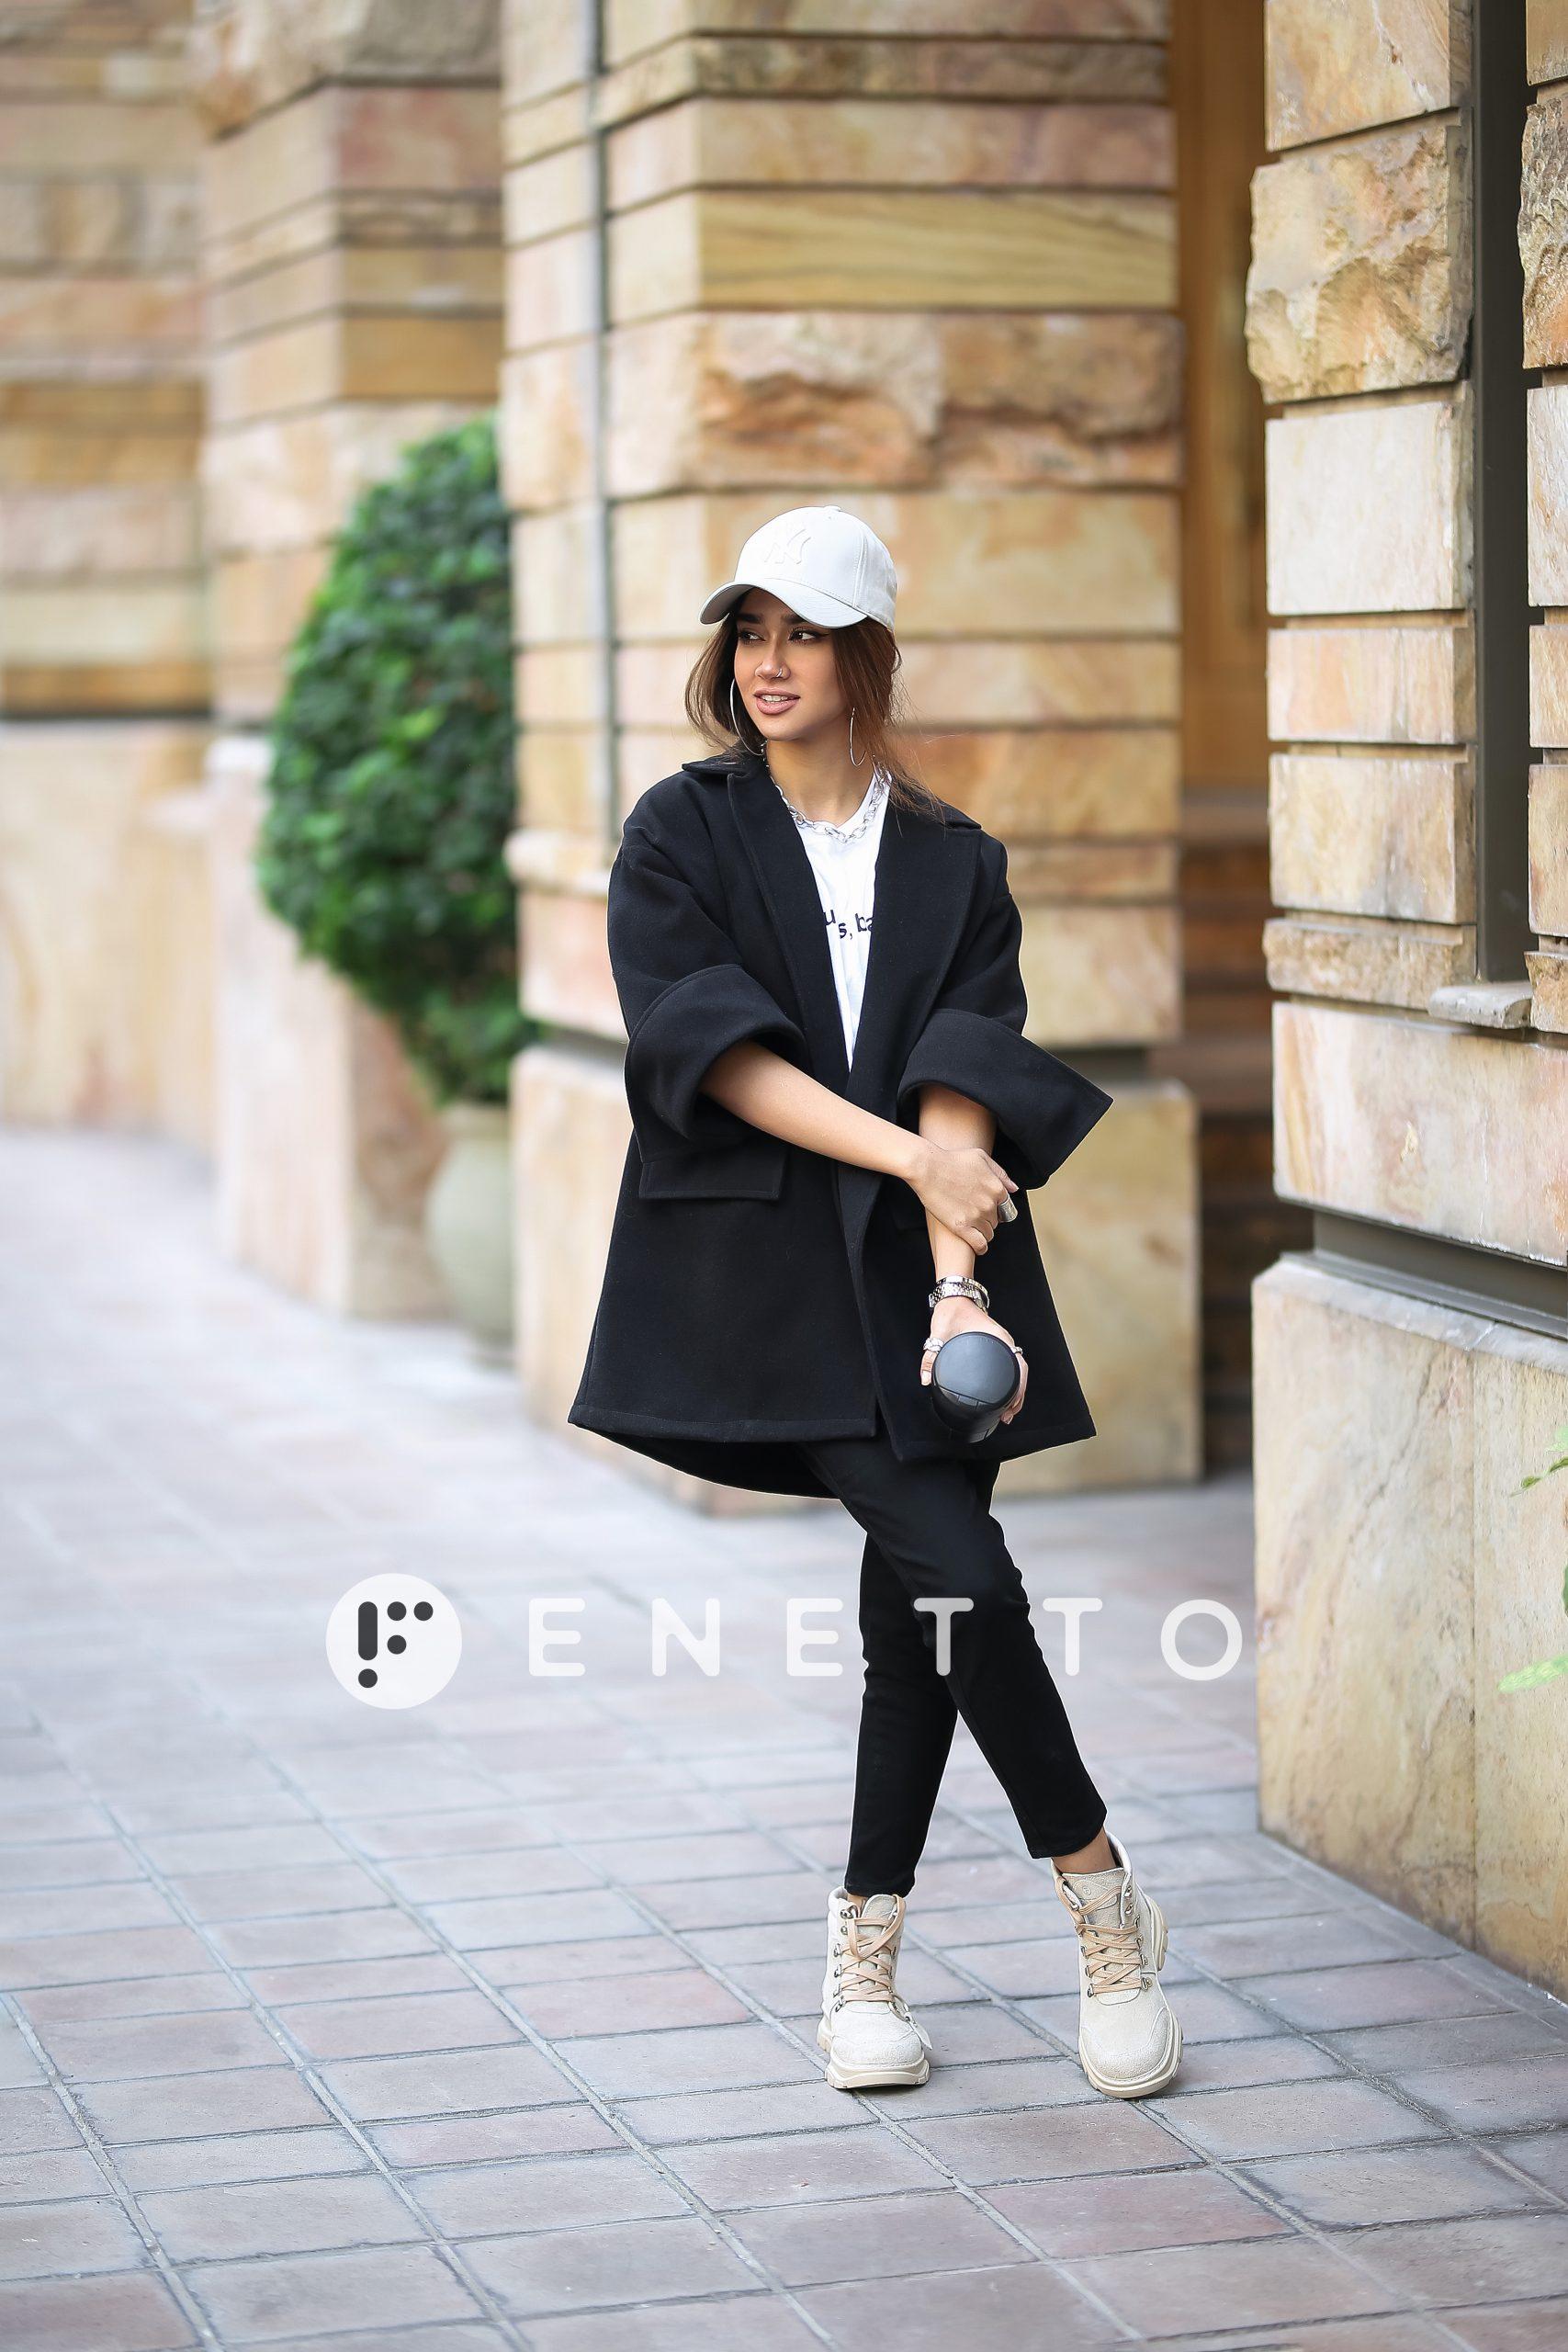 پالتو زنانه کوتاه مدل فوتر ساده (simple footer)